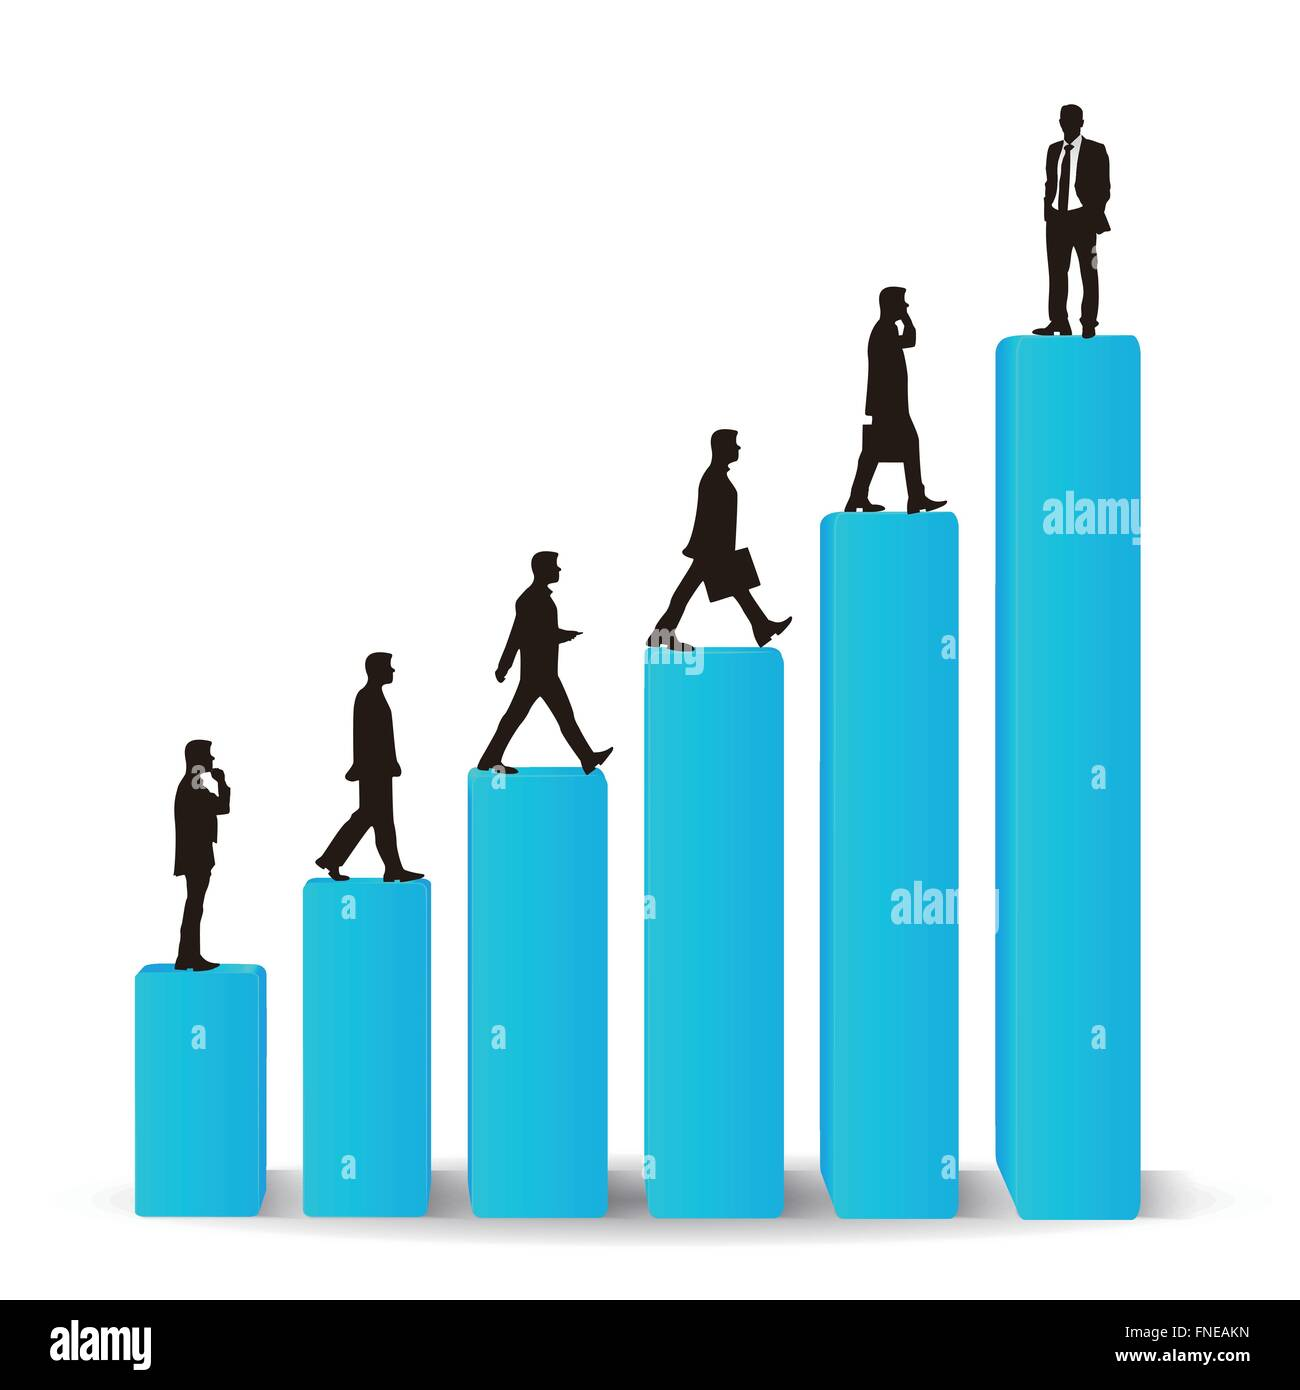 businessman career promotion graph stock photo royalty image businessman career promotion graph